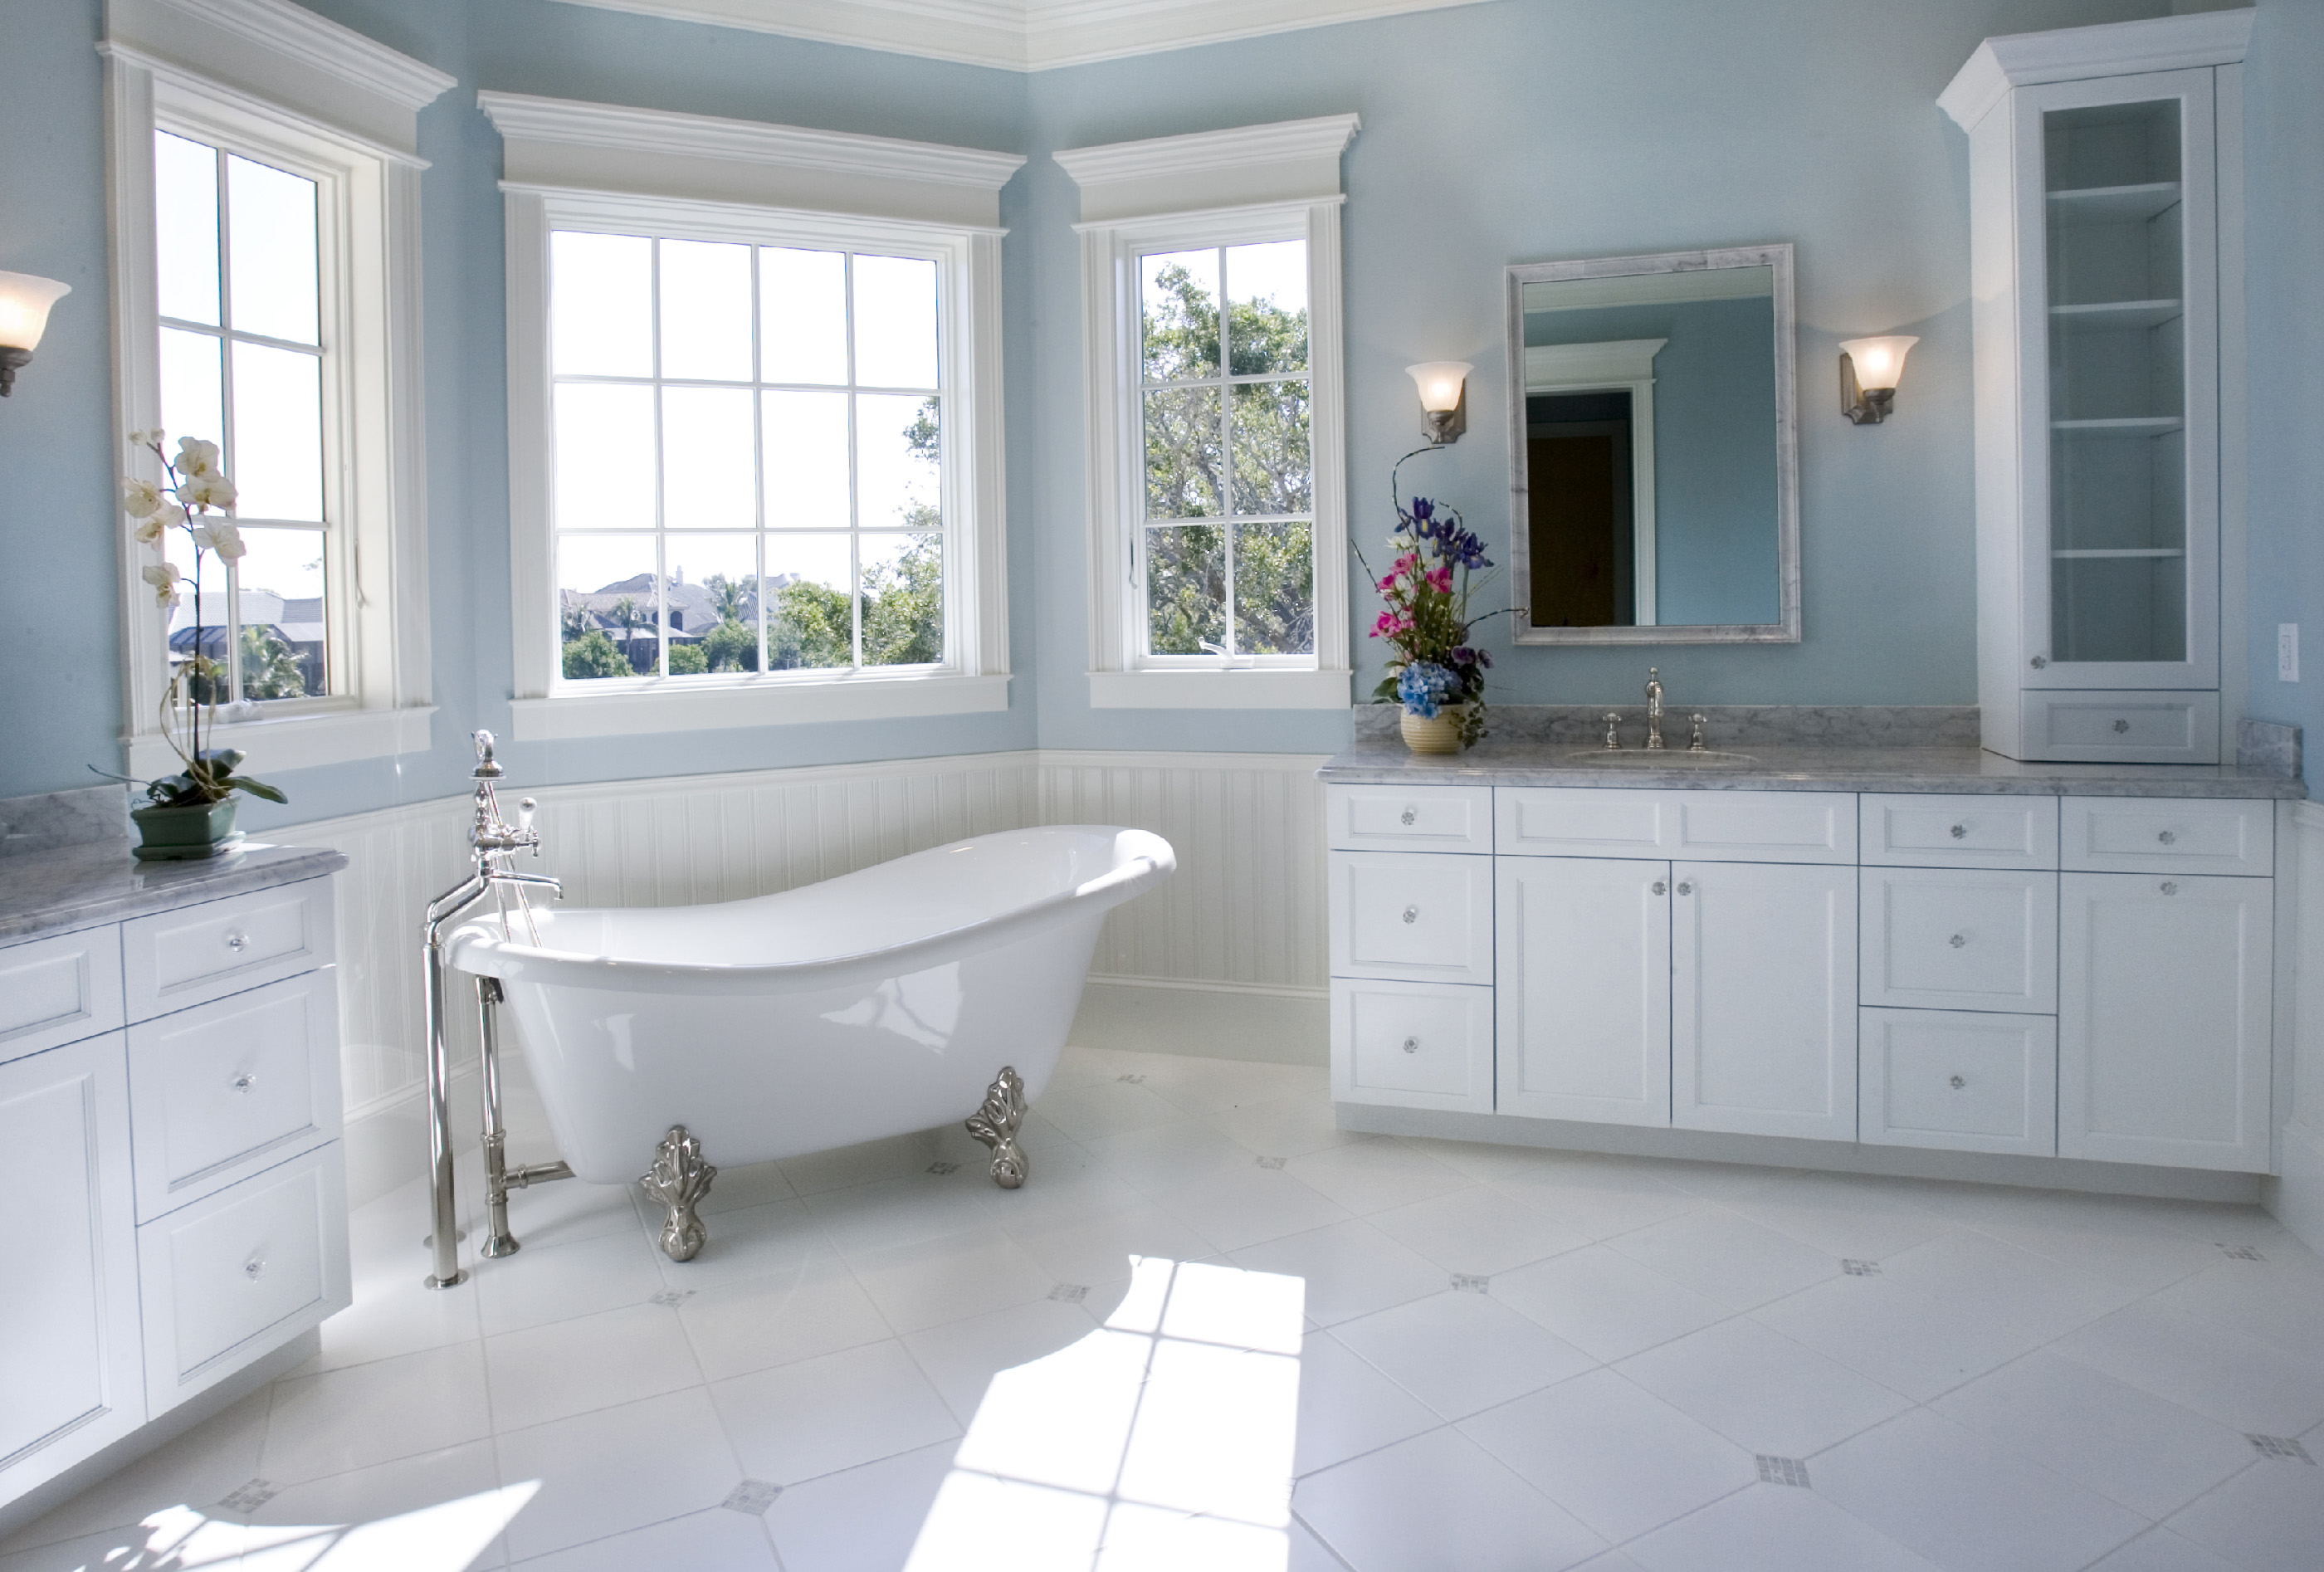 Luxury Master Bathroom with Free Standing Bath Tub